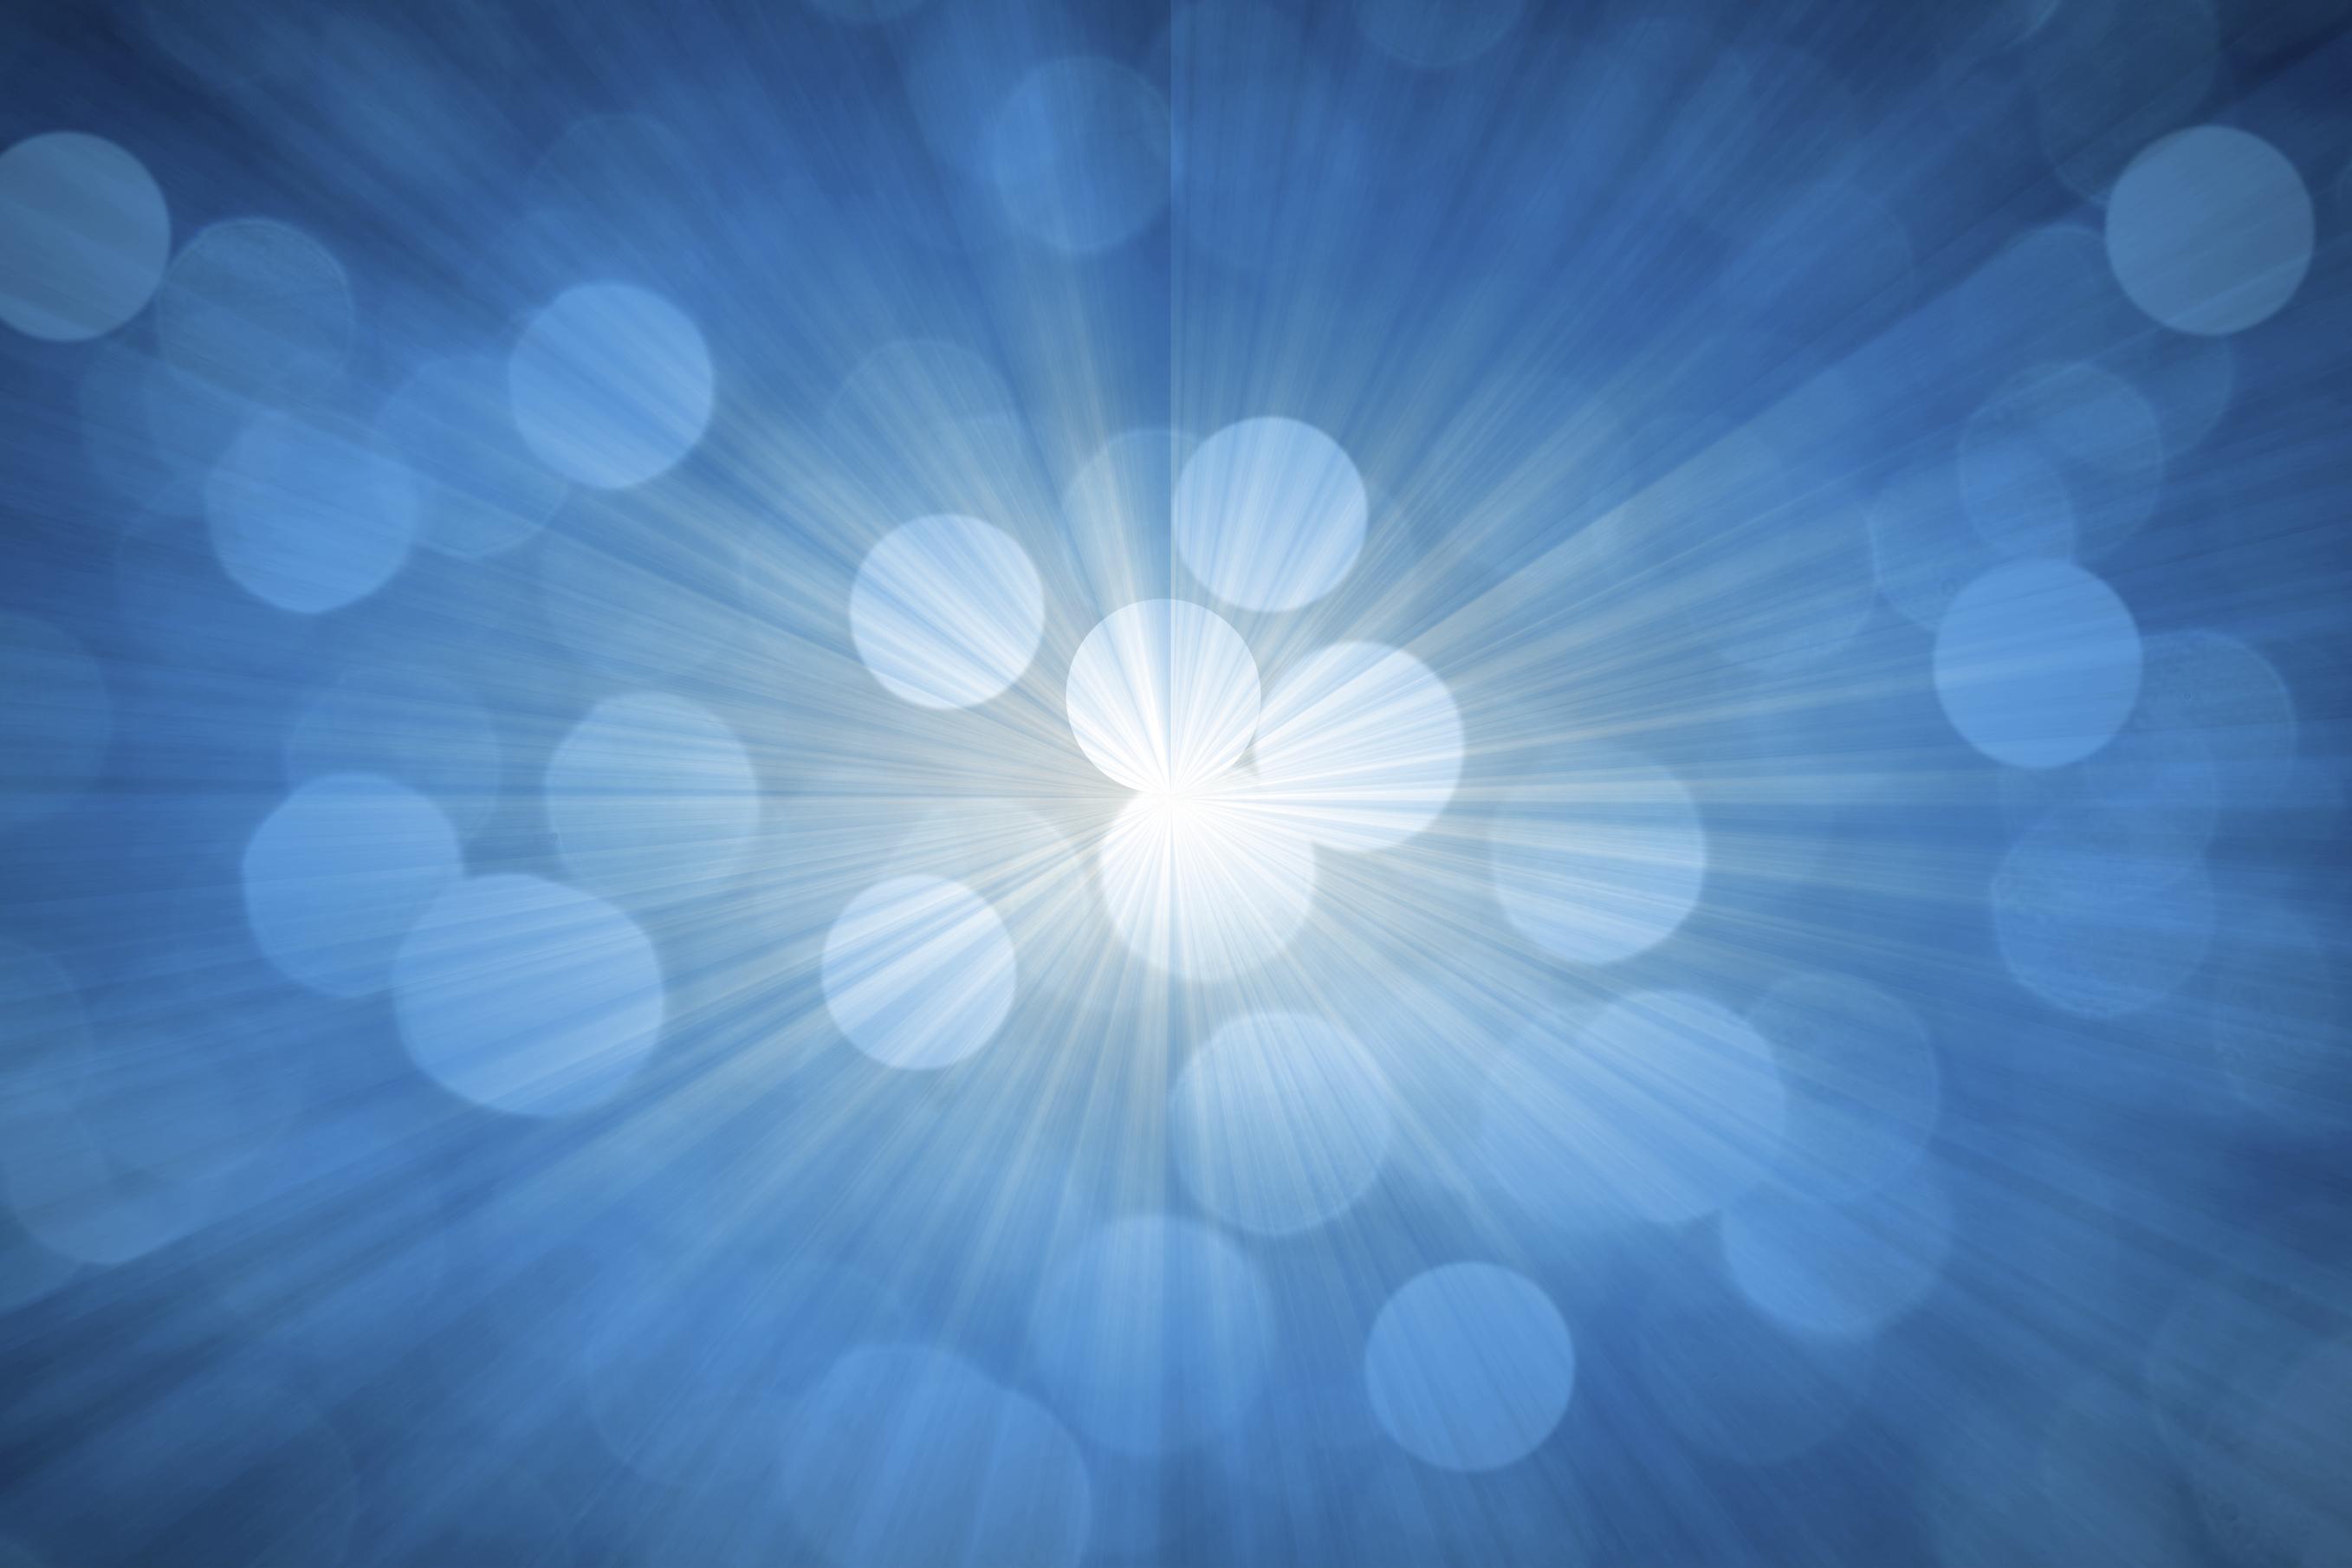 image of pulsing blue light